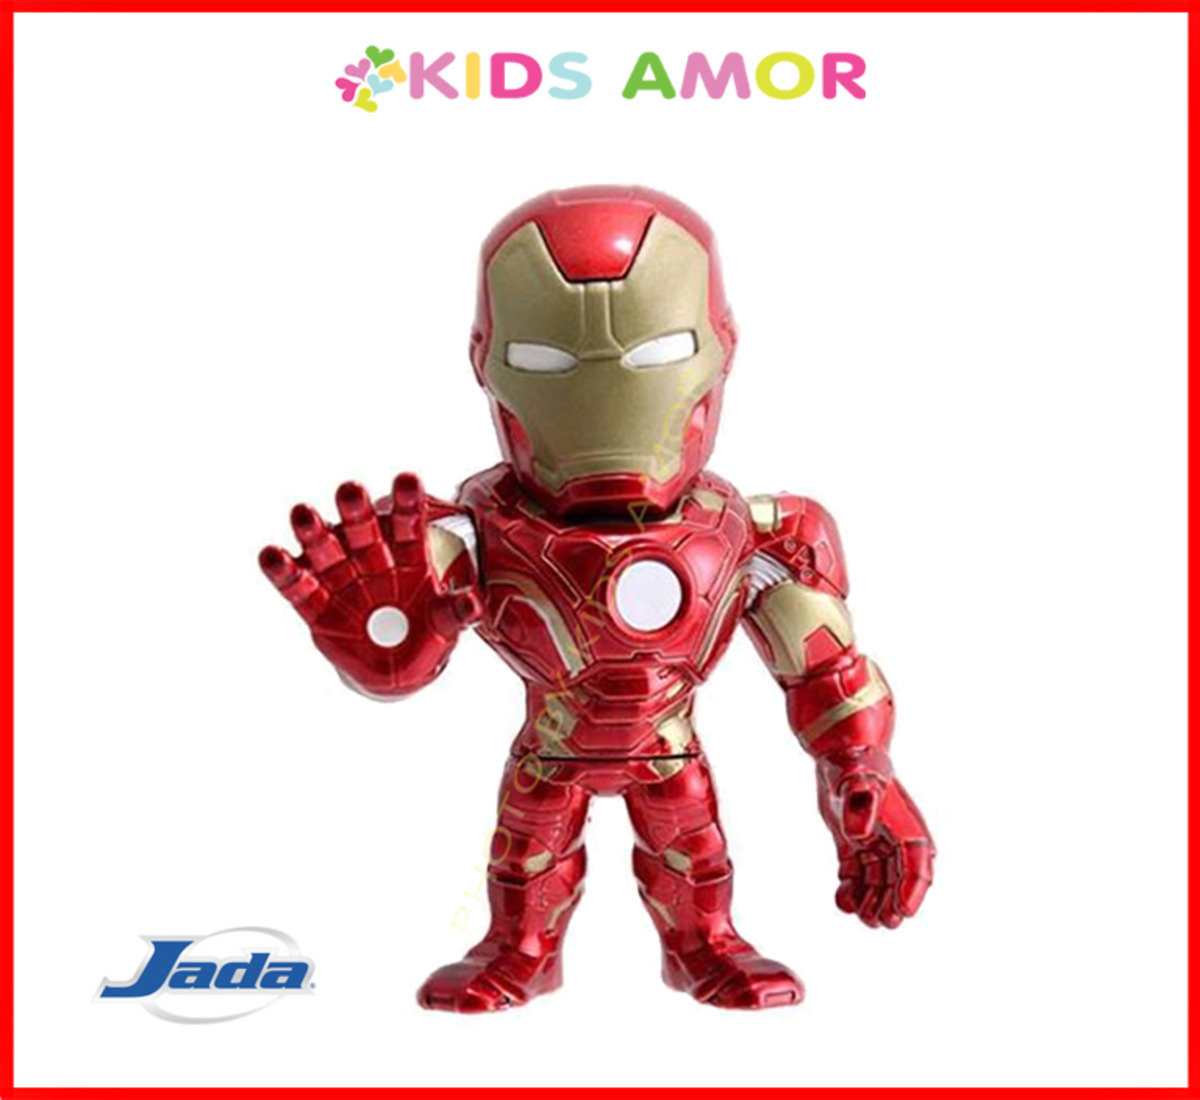 "Marvel Captain America 美國隊長3 Civil War: 4"" 合金Figure - 鐵甲奇俠 Iron Man"